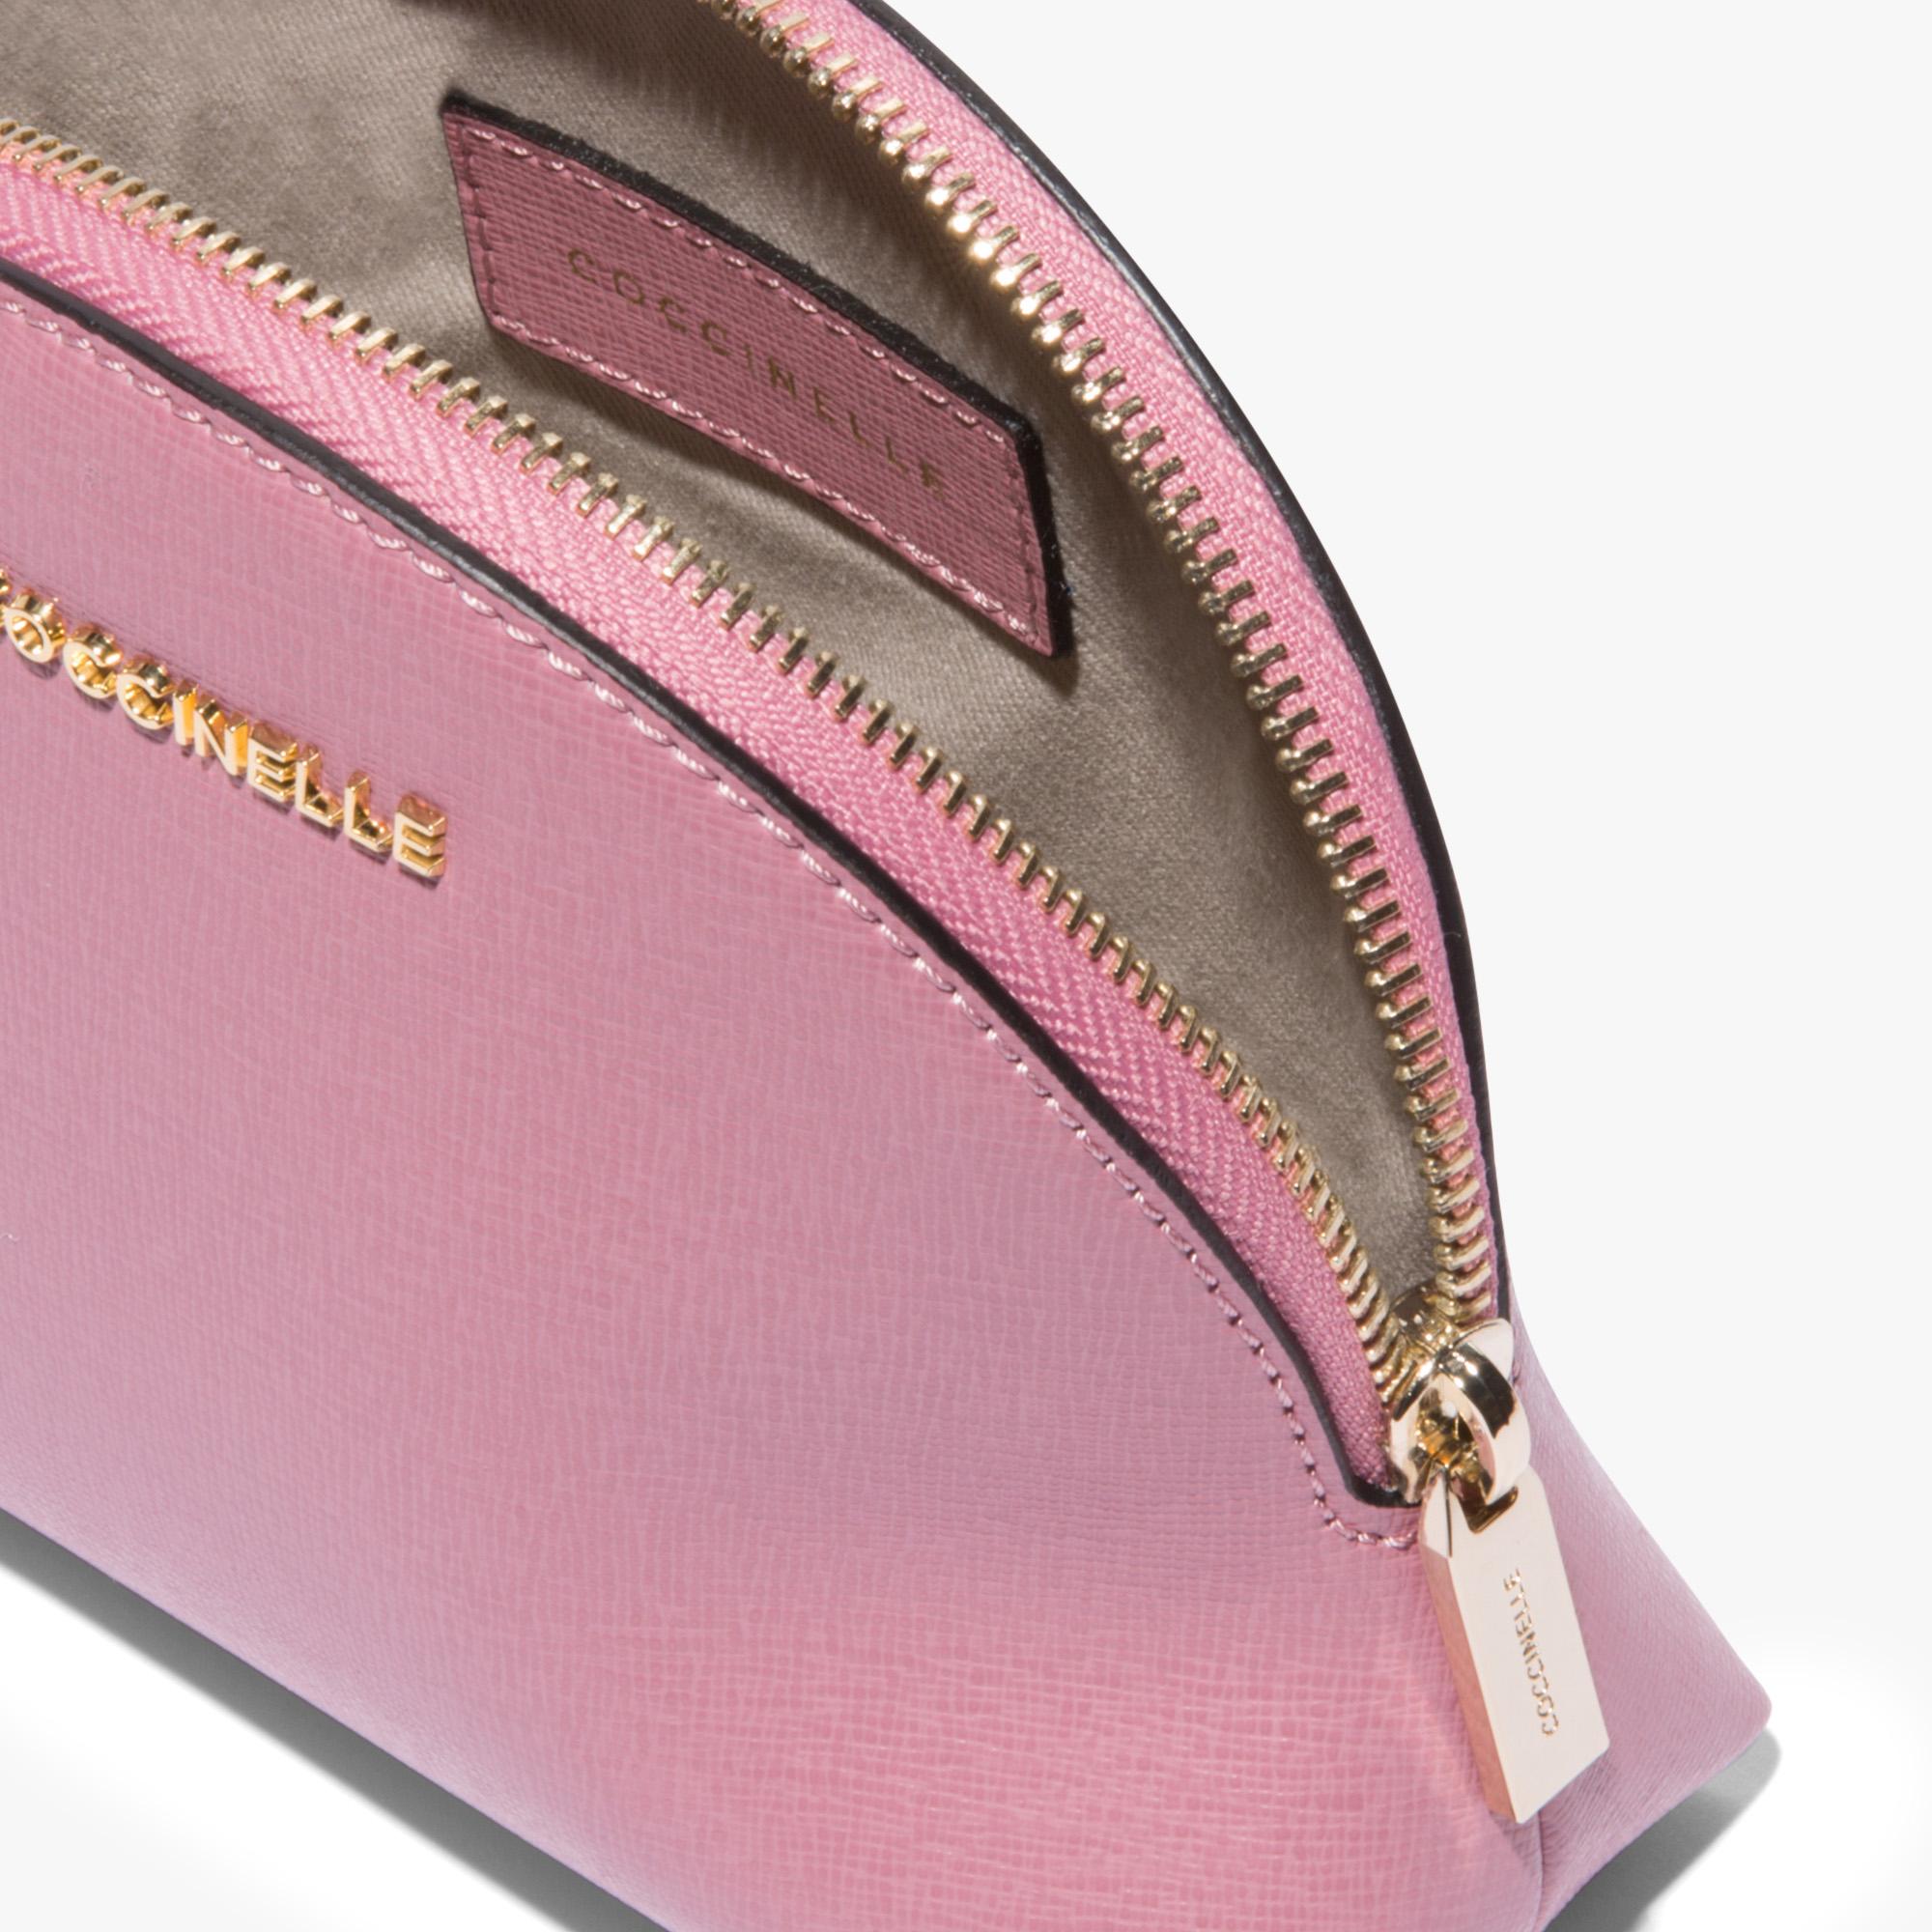 Saffiano leather vanity case trio